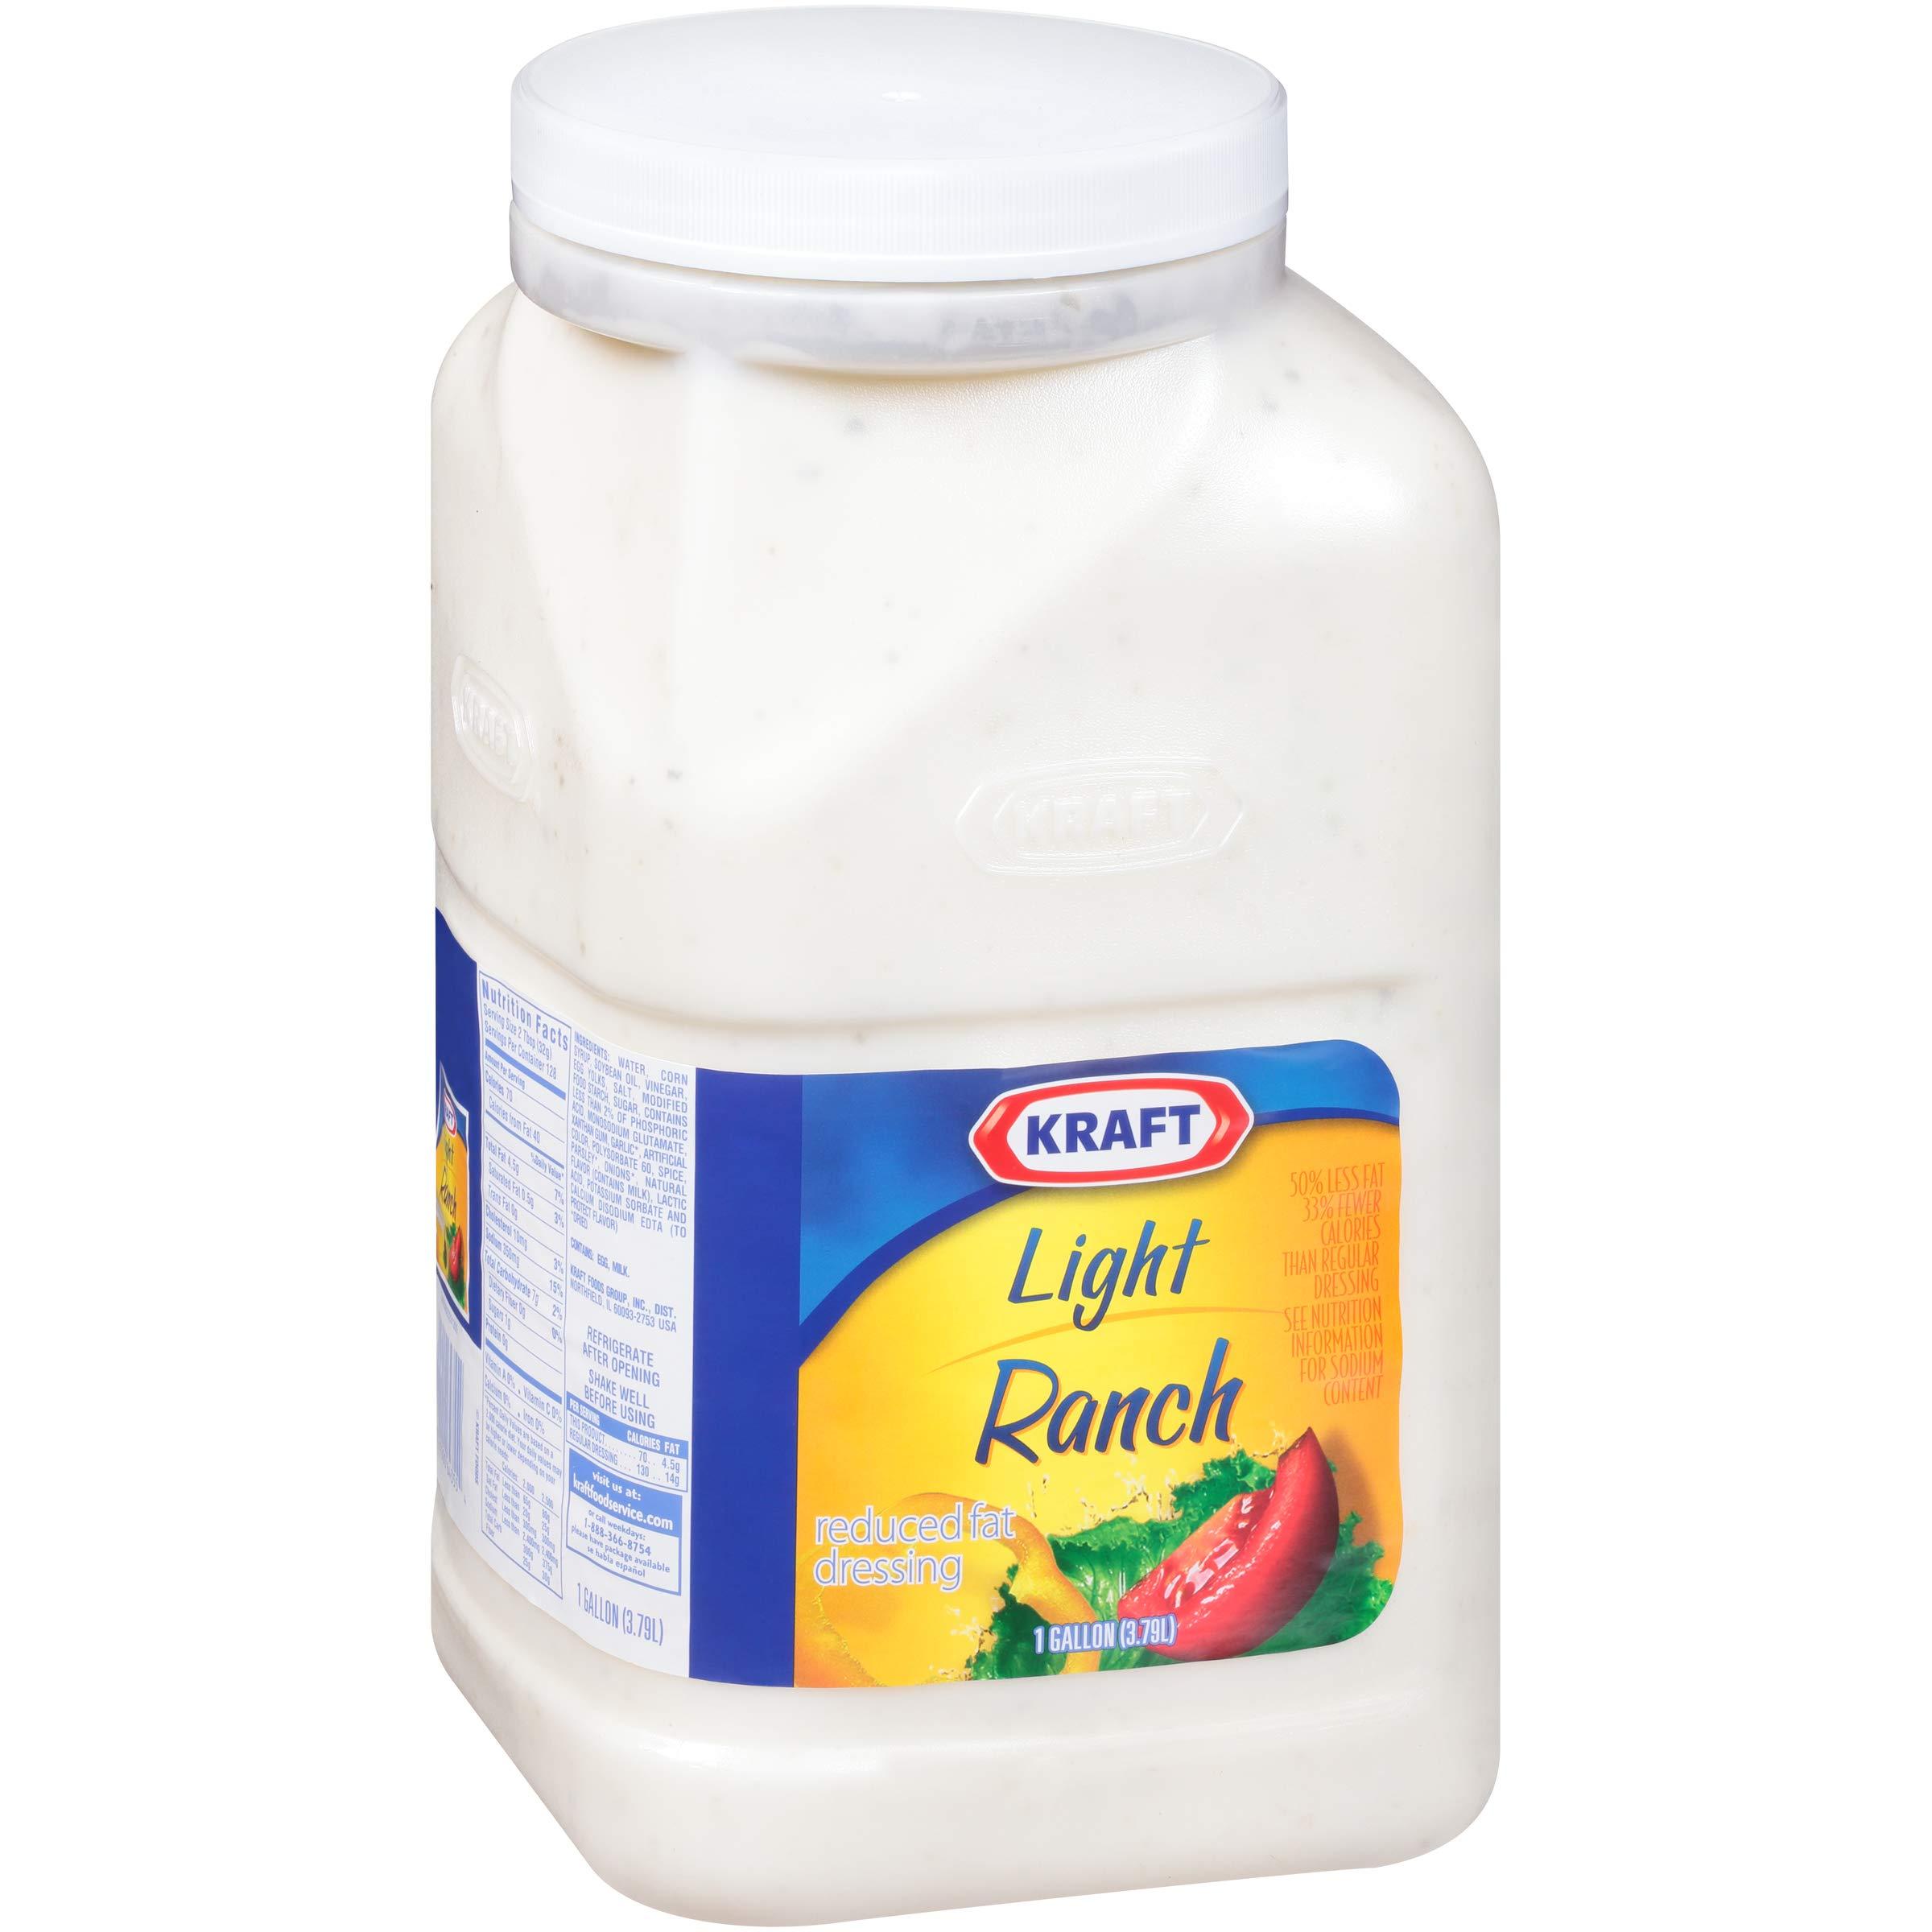 Kraft Ranch Reduced Fat Salad Dressing (1 gal Jugs, Pack of 4) by Kraft